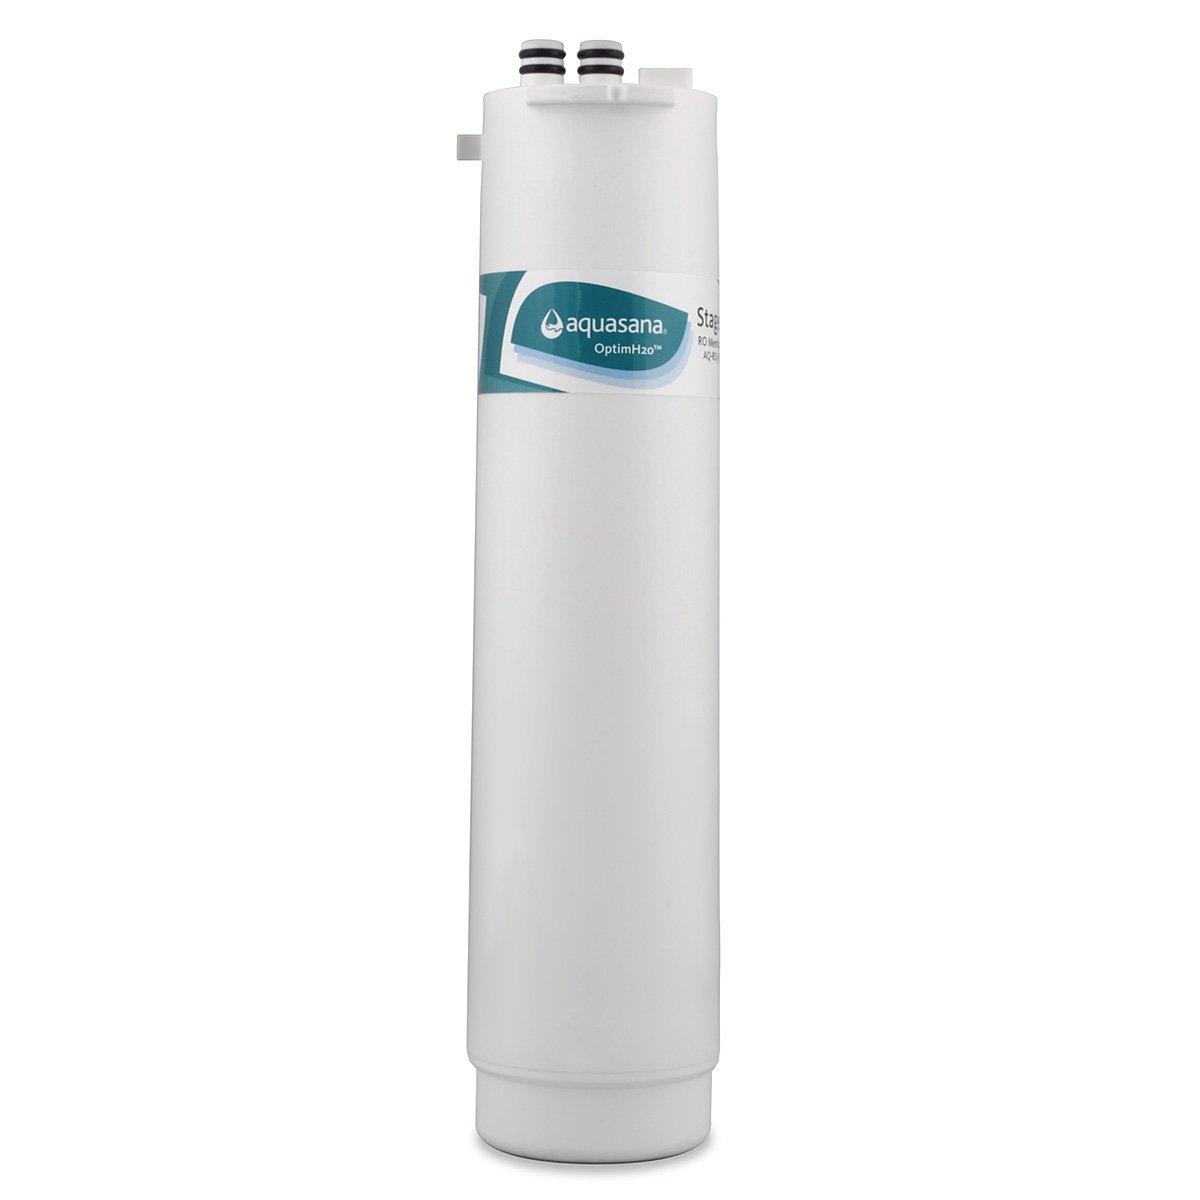 Aquasana Replacement RO Membrane Filter, Stage 2,for Aquasana OptimH20 Reverse Osmosis Water Filter